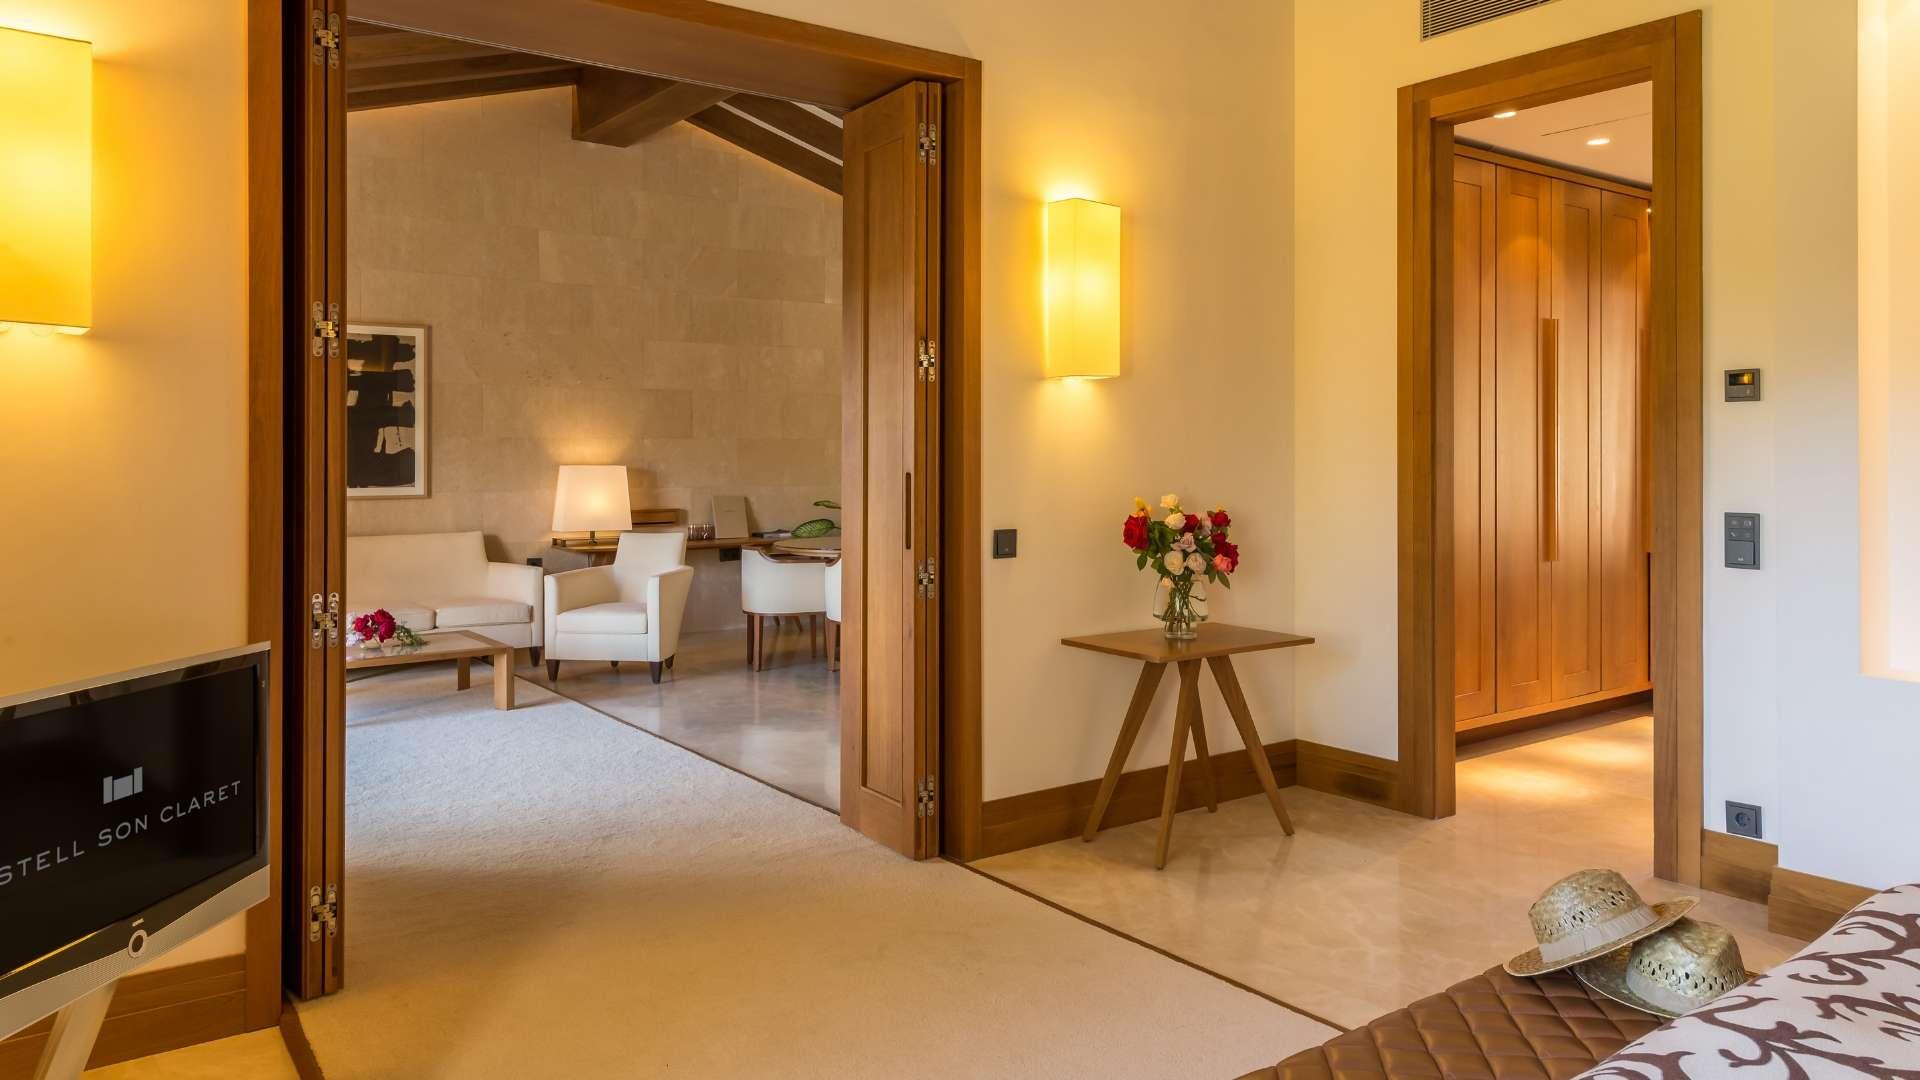 Castell Son Claret Pool Suites Mallorca (2)